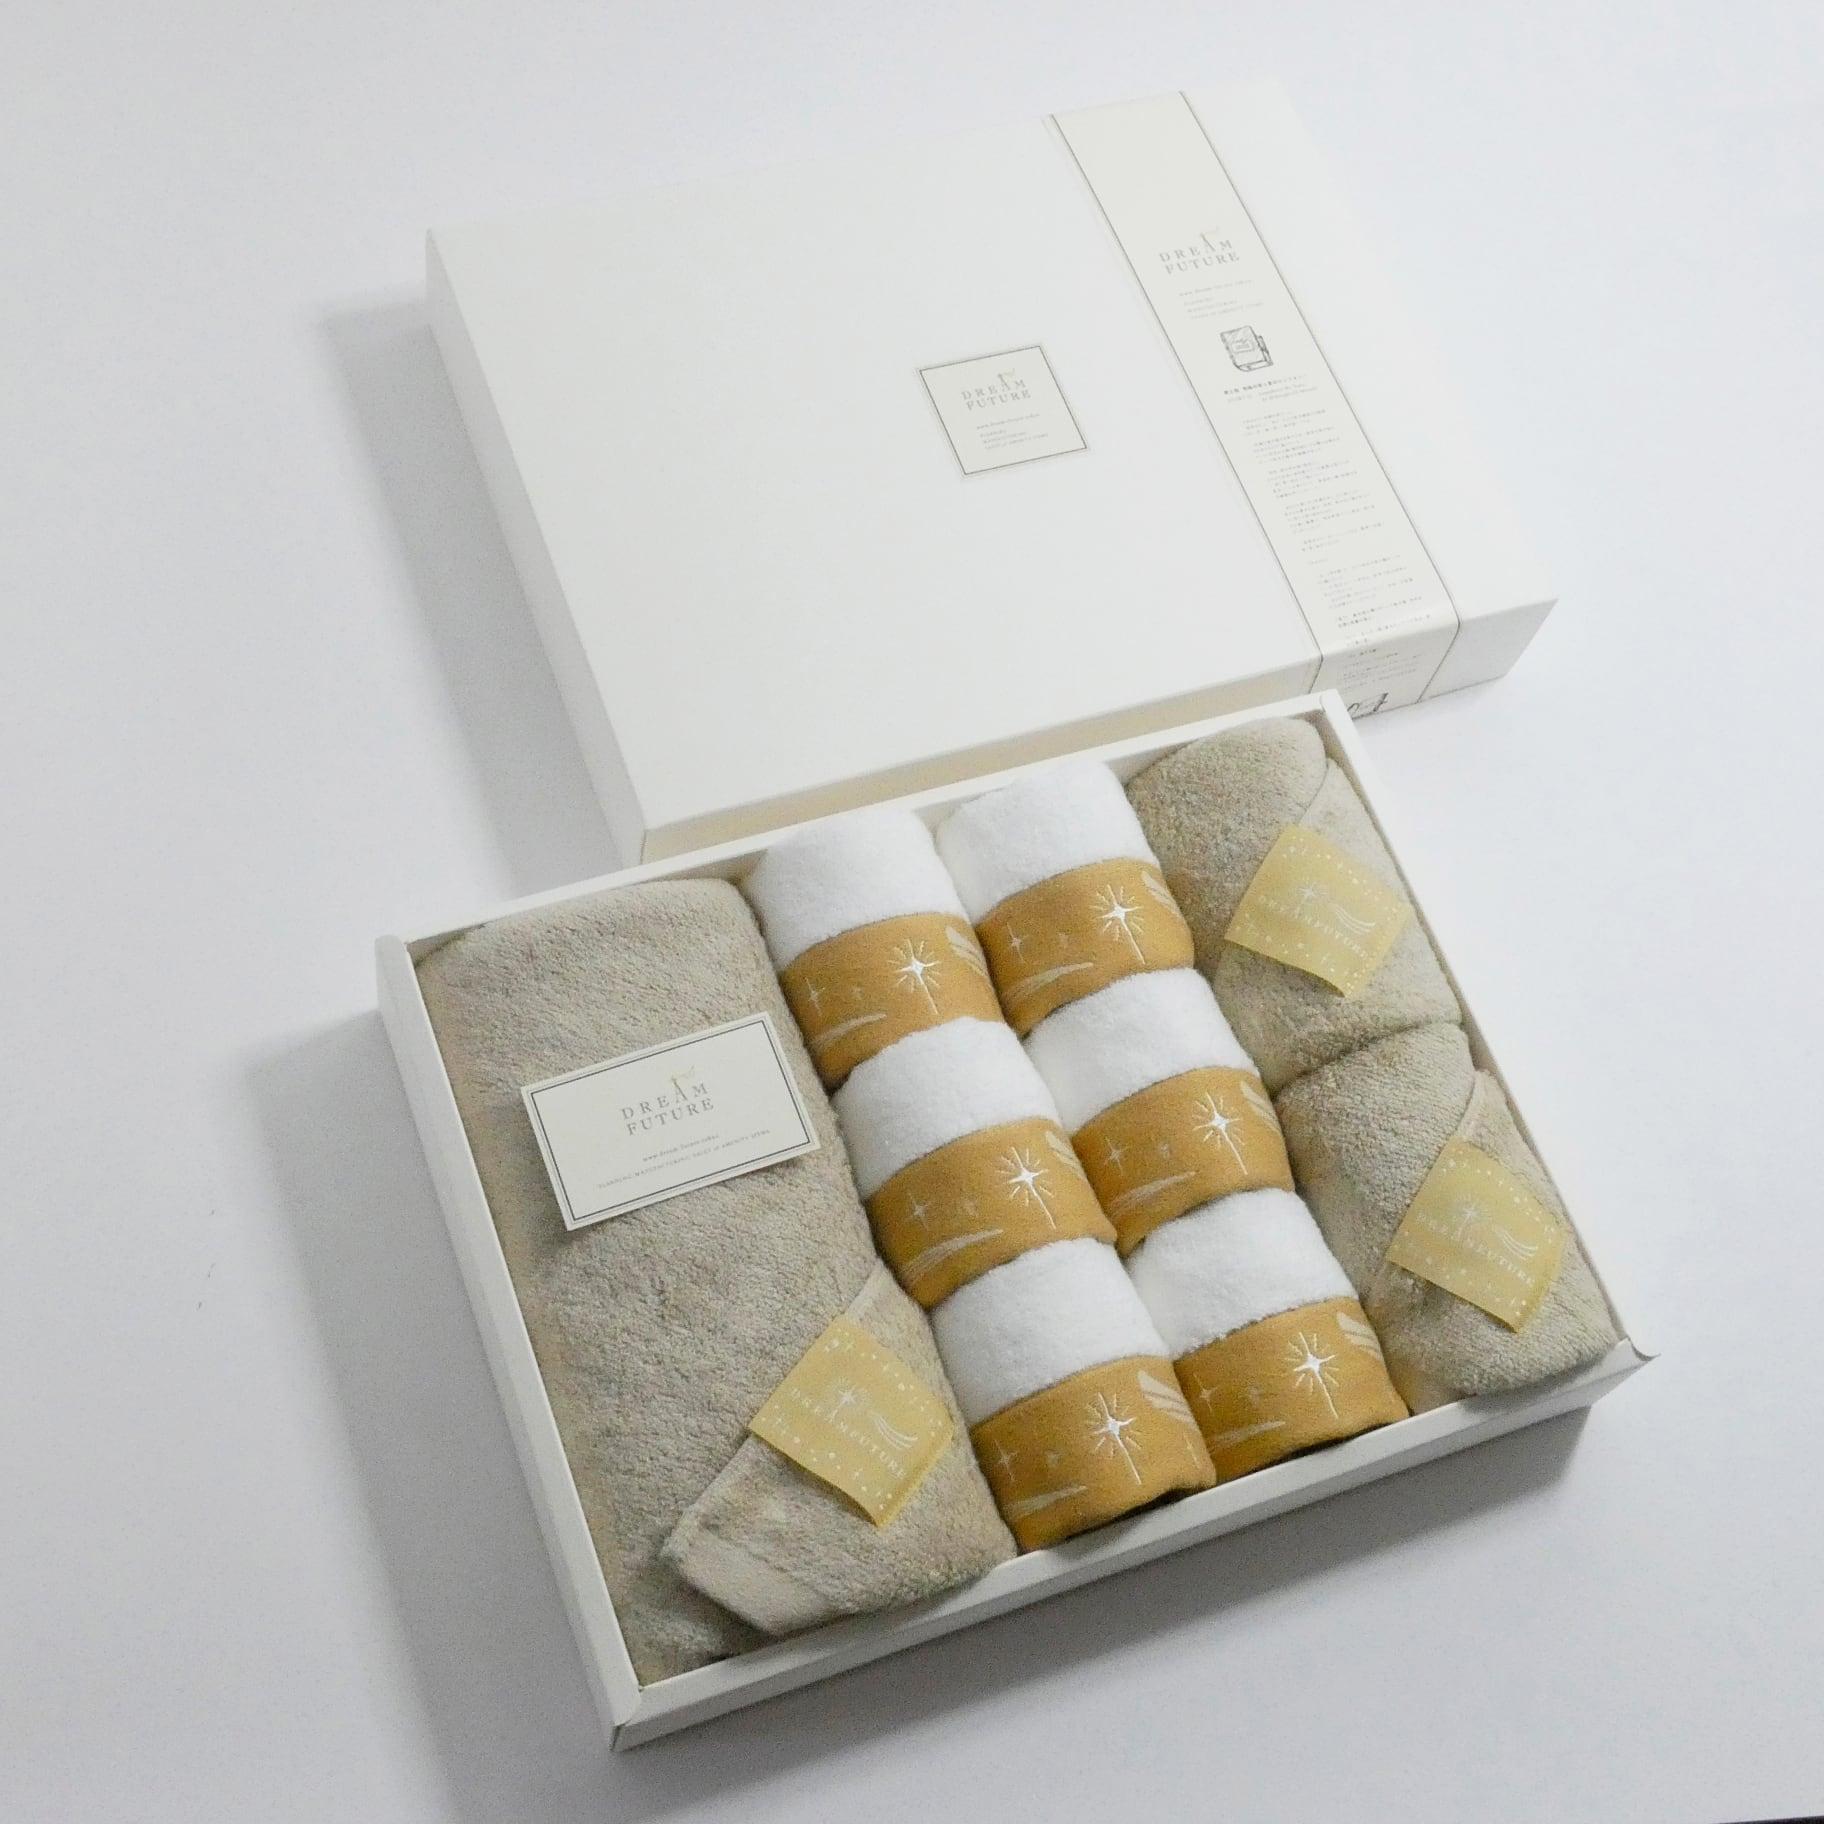 Star Premium Beige & Twinkle BEIGE 無撚糸(むねんし)高級Bath×Face×Hand Towel SET Star Beige / Star Beige  / Twinkle BEIGE